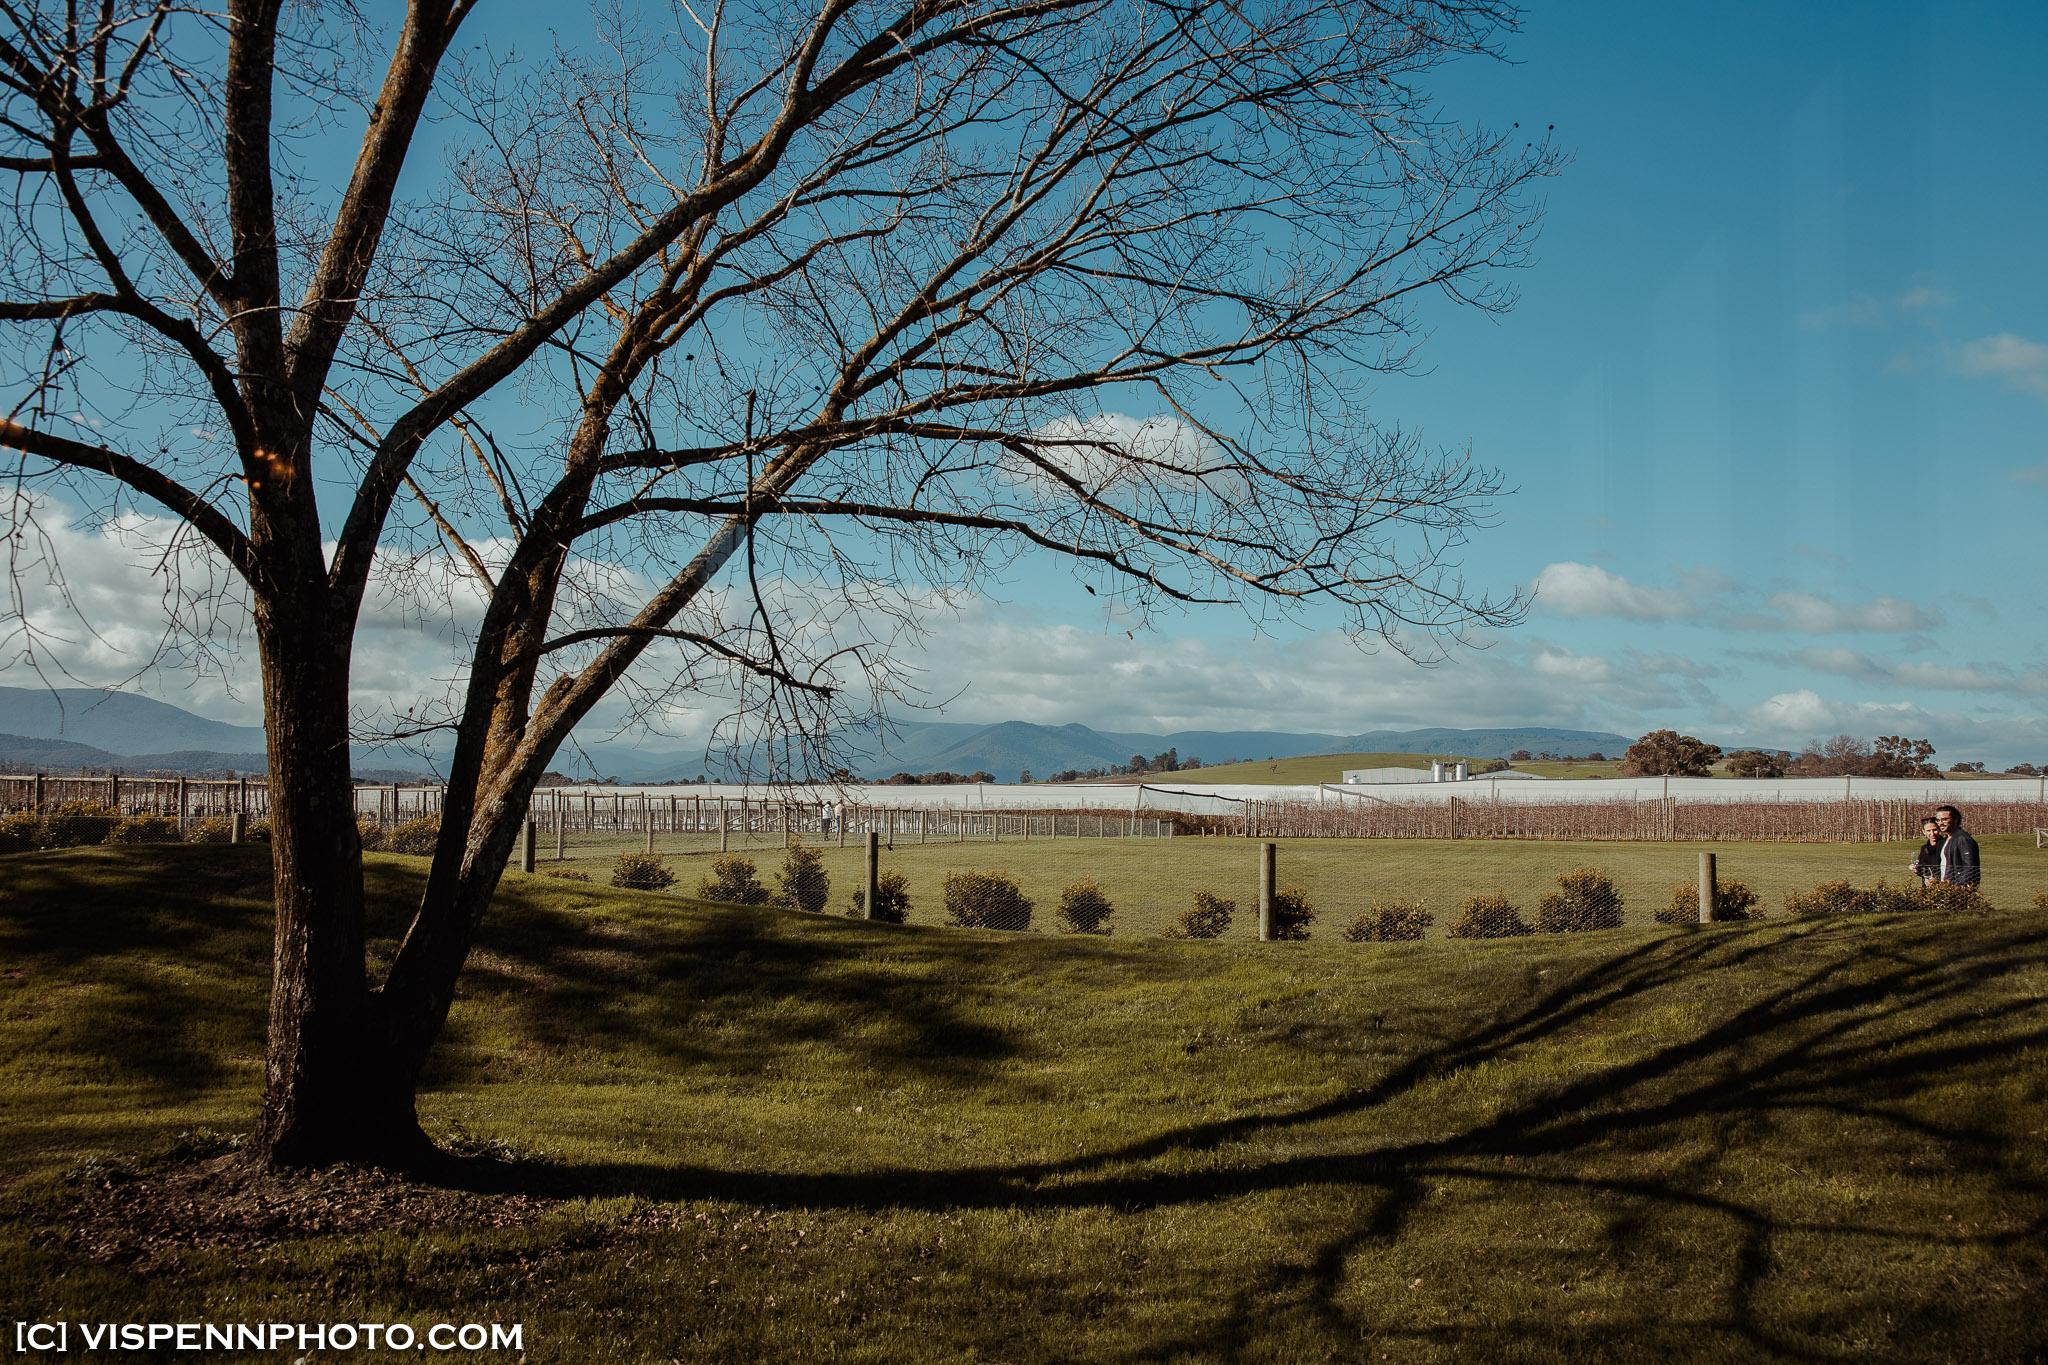 WEDDING DAY Photography Melbourne CoreyCoco 1P 01380 EOSR ZHPENN